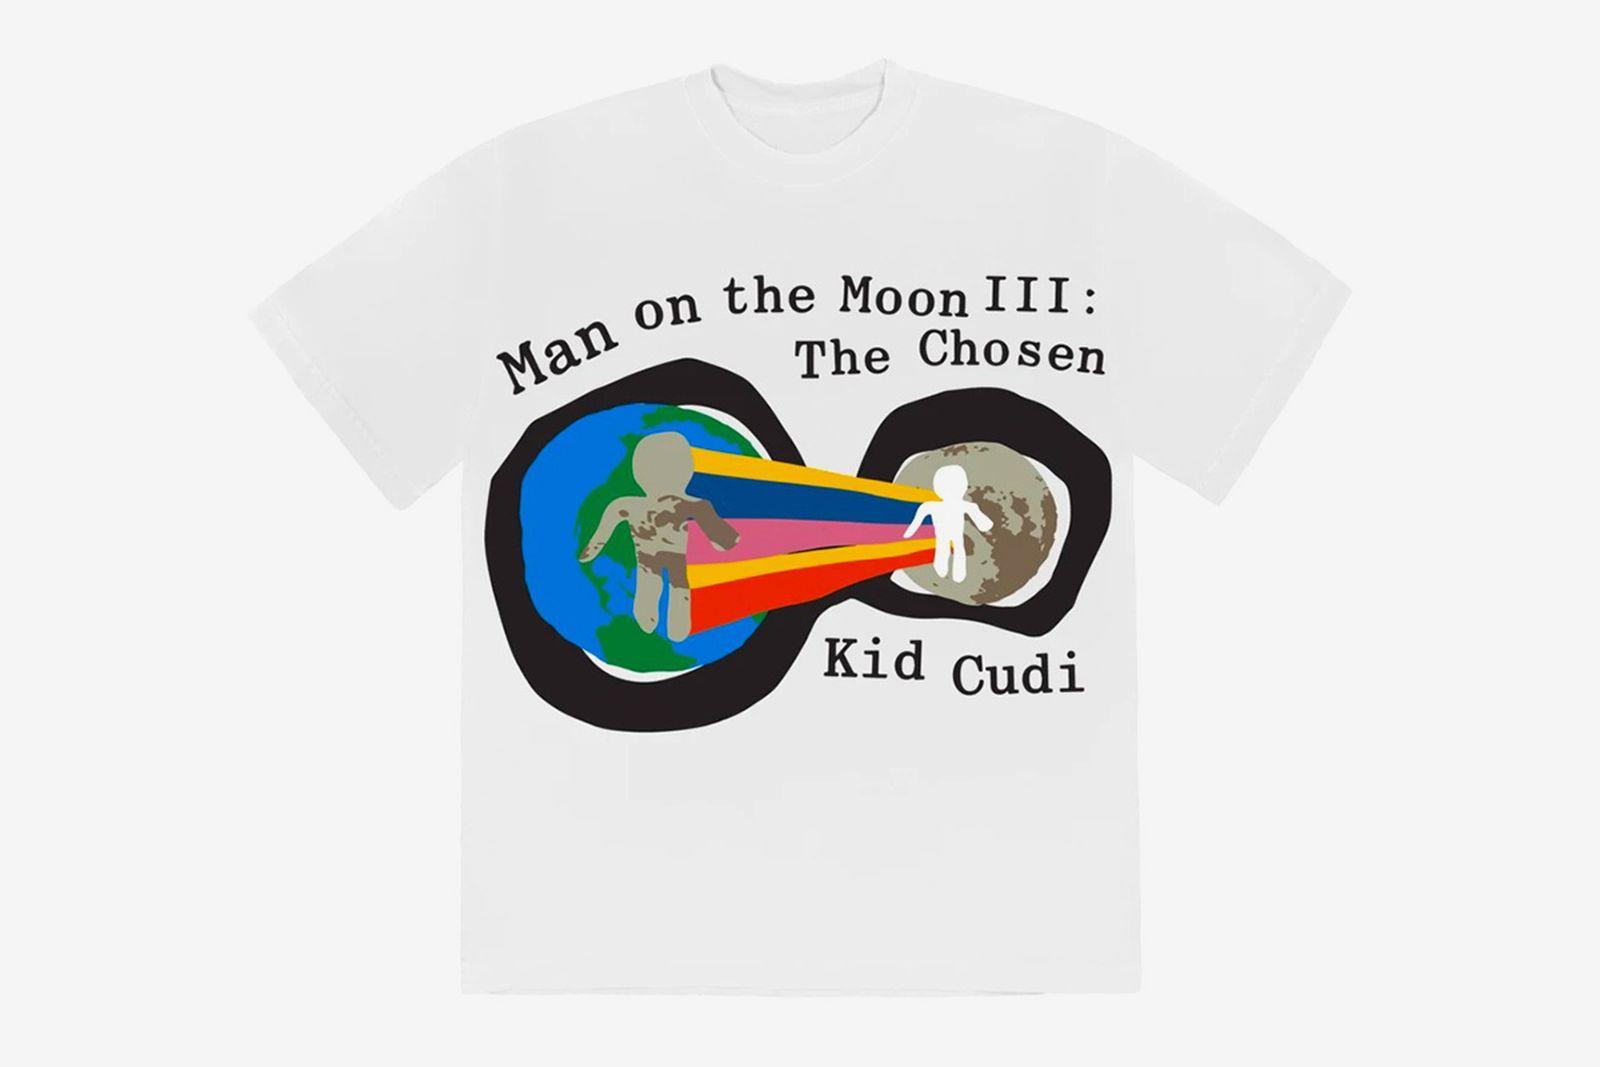 kid-cudi-cactus-plant-flea-market-motm-iii-merch-08